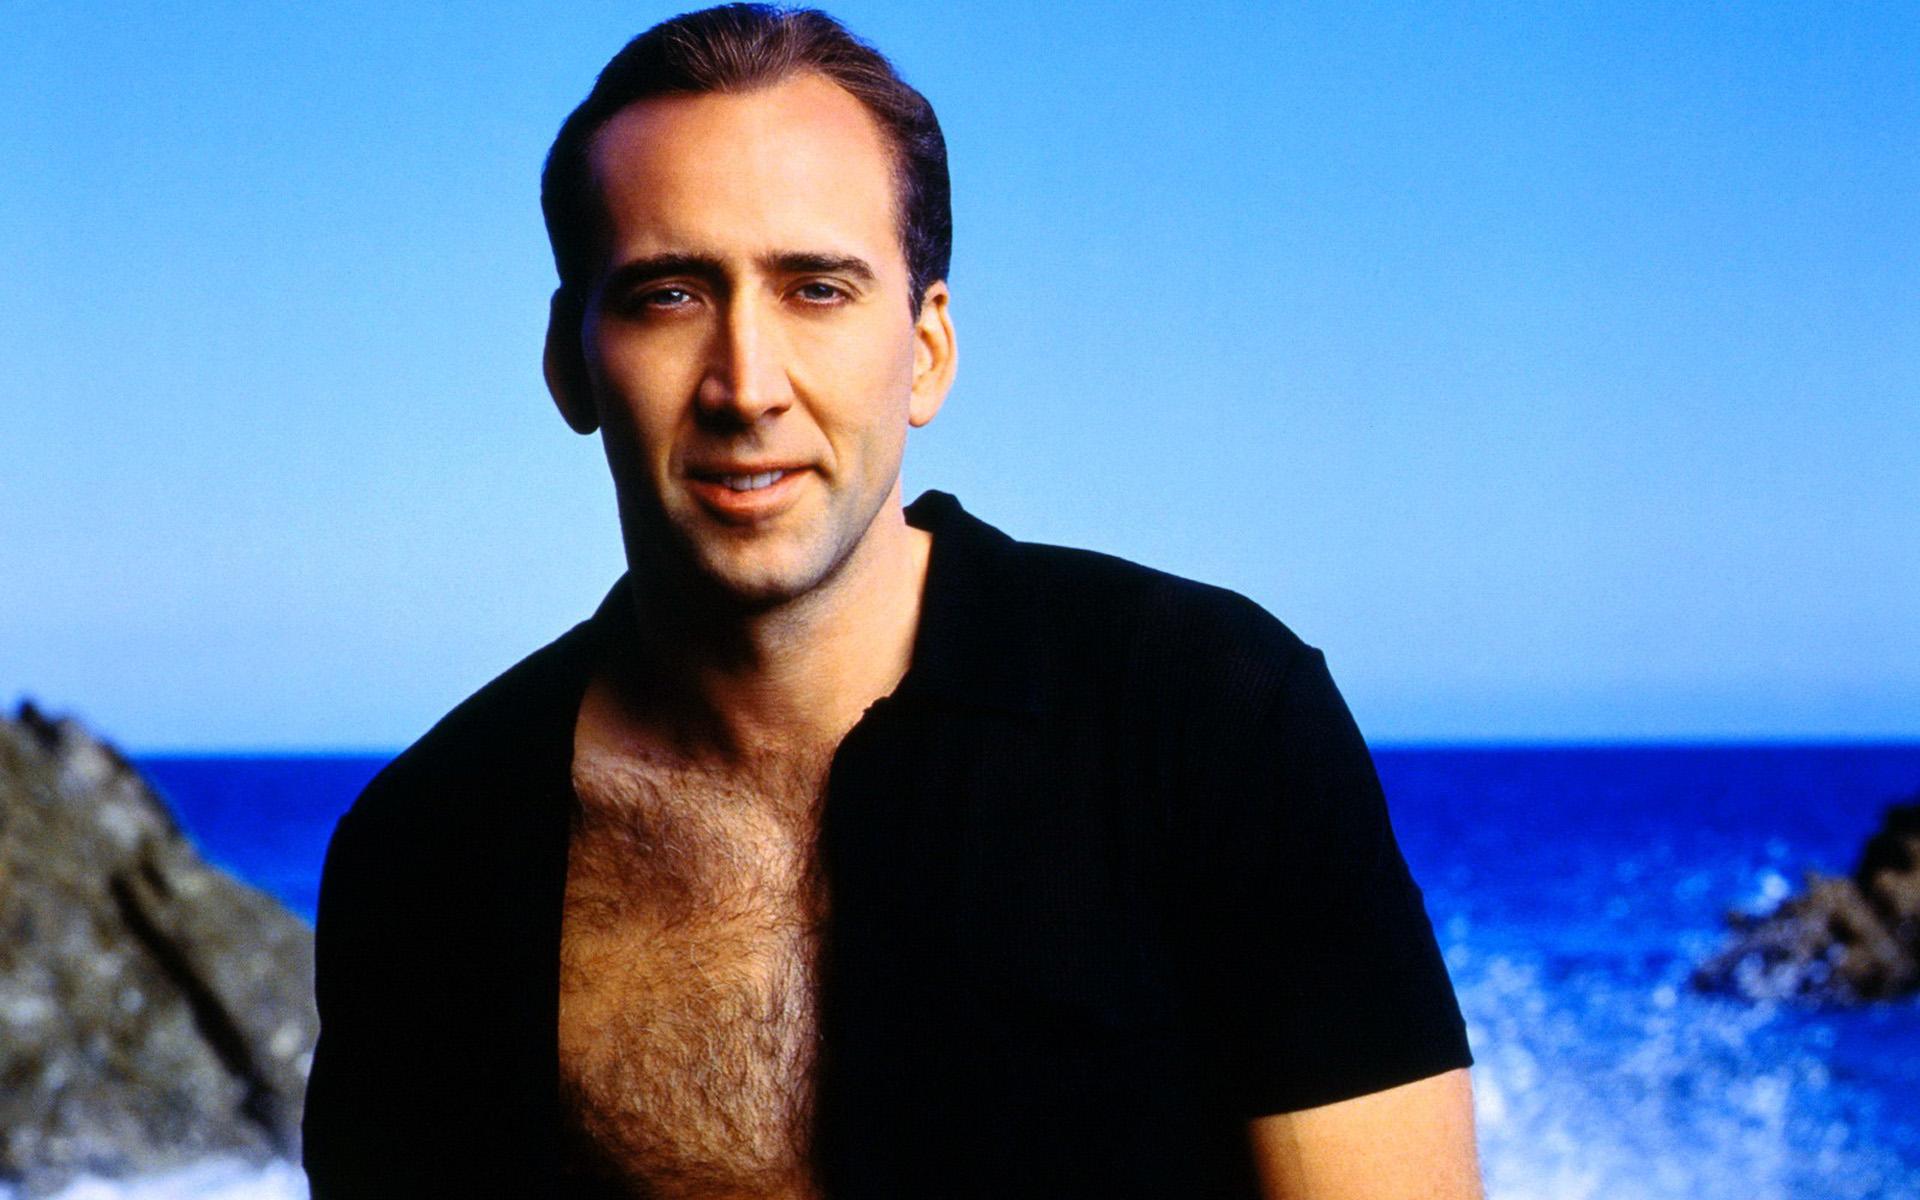 33] Nicolas Cage Wallpapers on WallpaperSafari 1920x1200